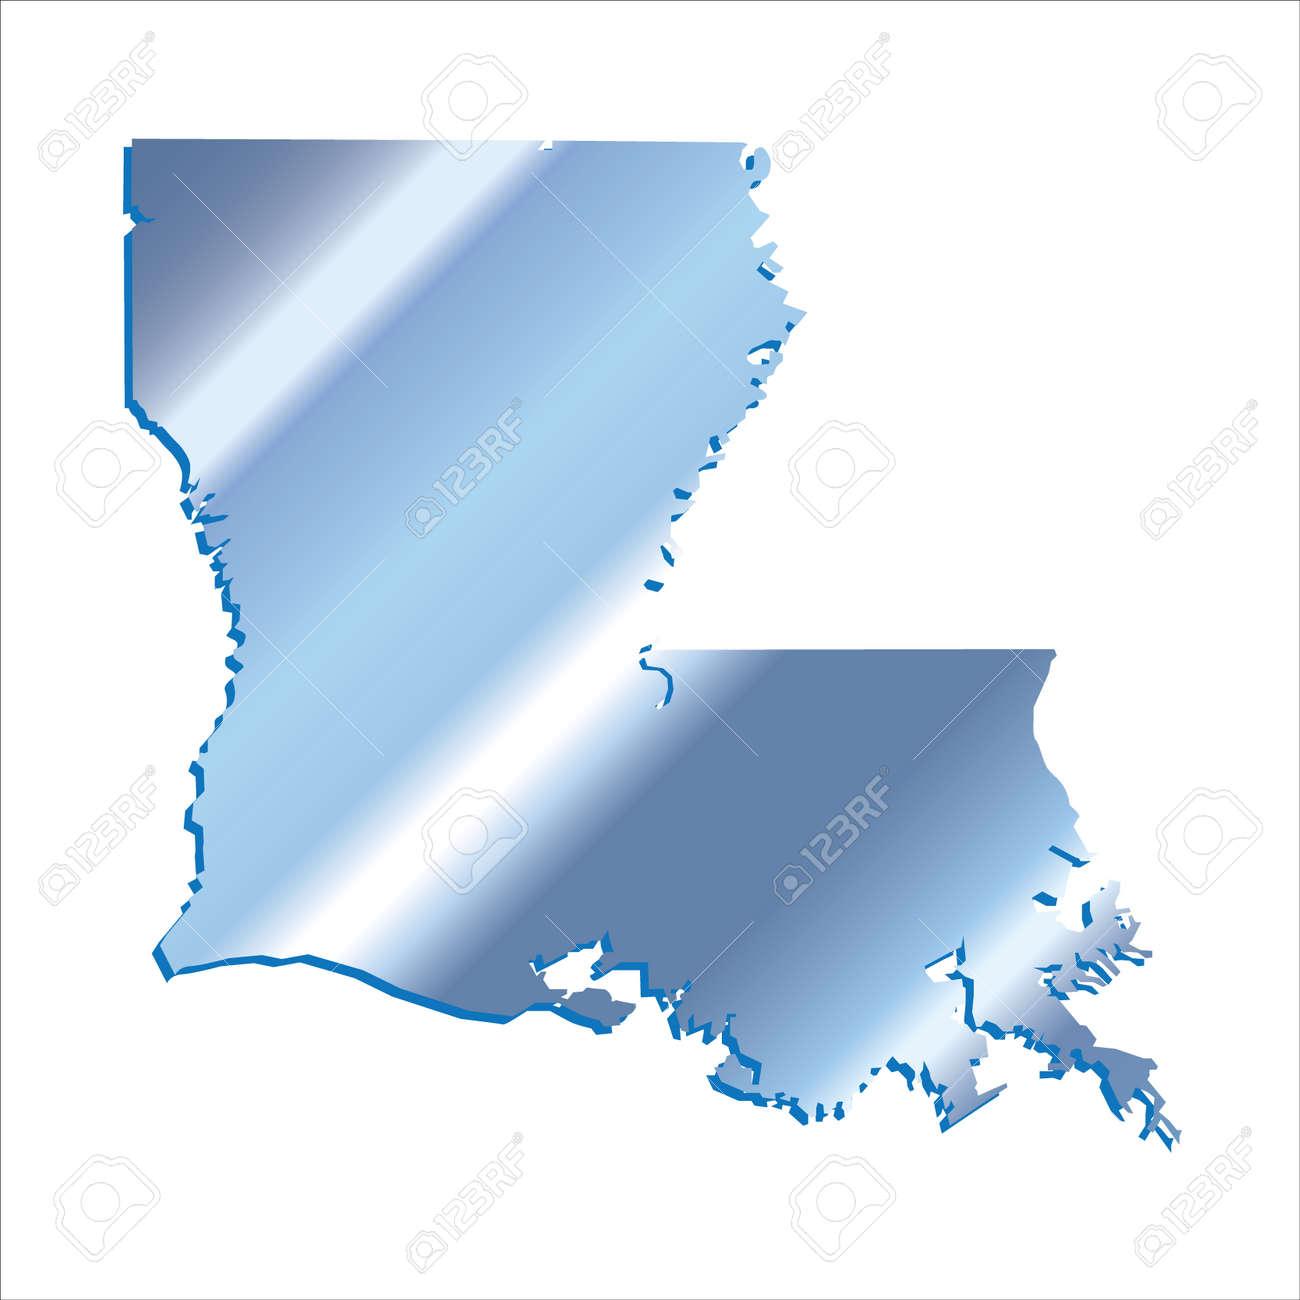 3d Louisiana Usa Iridium Blue Outline Map With Shadow Royalty Free